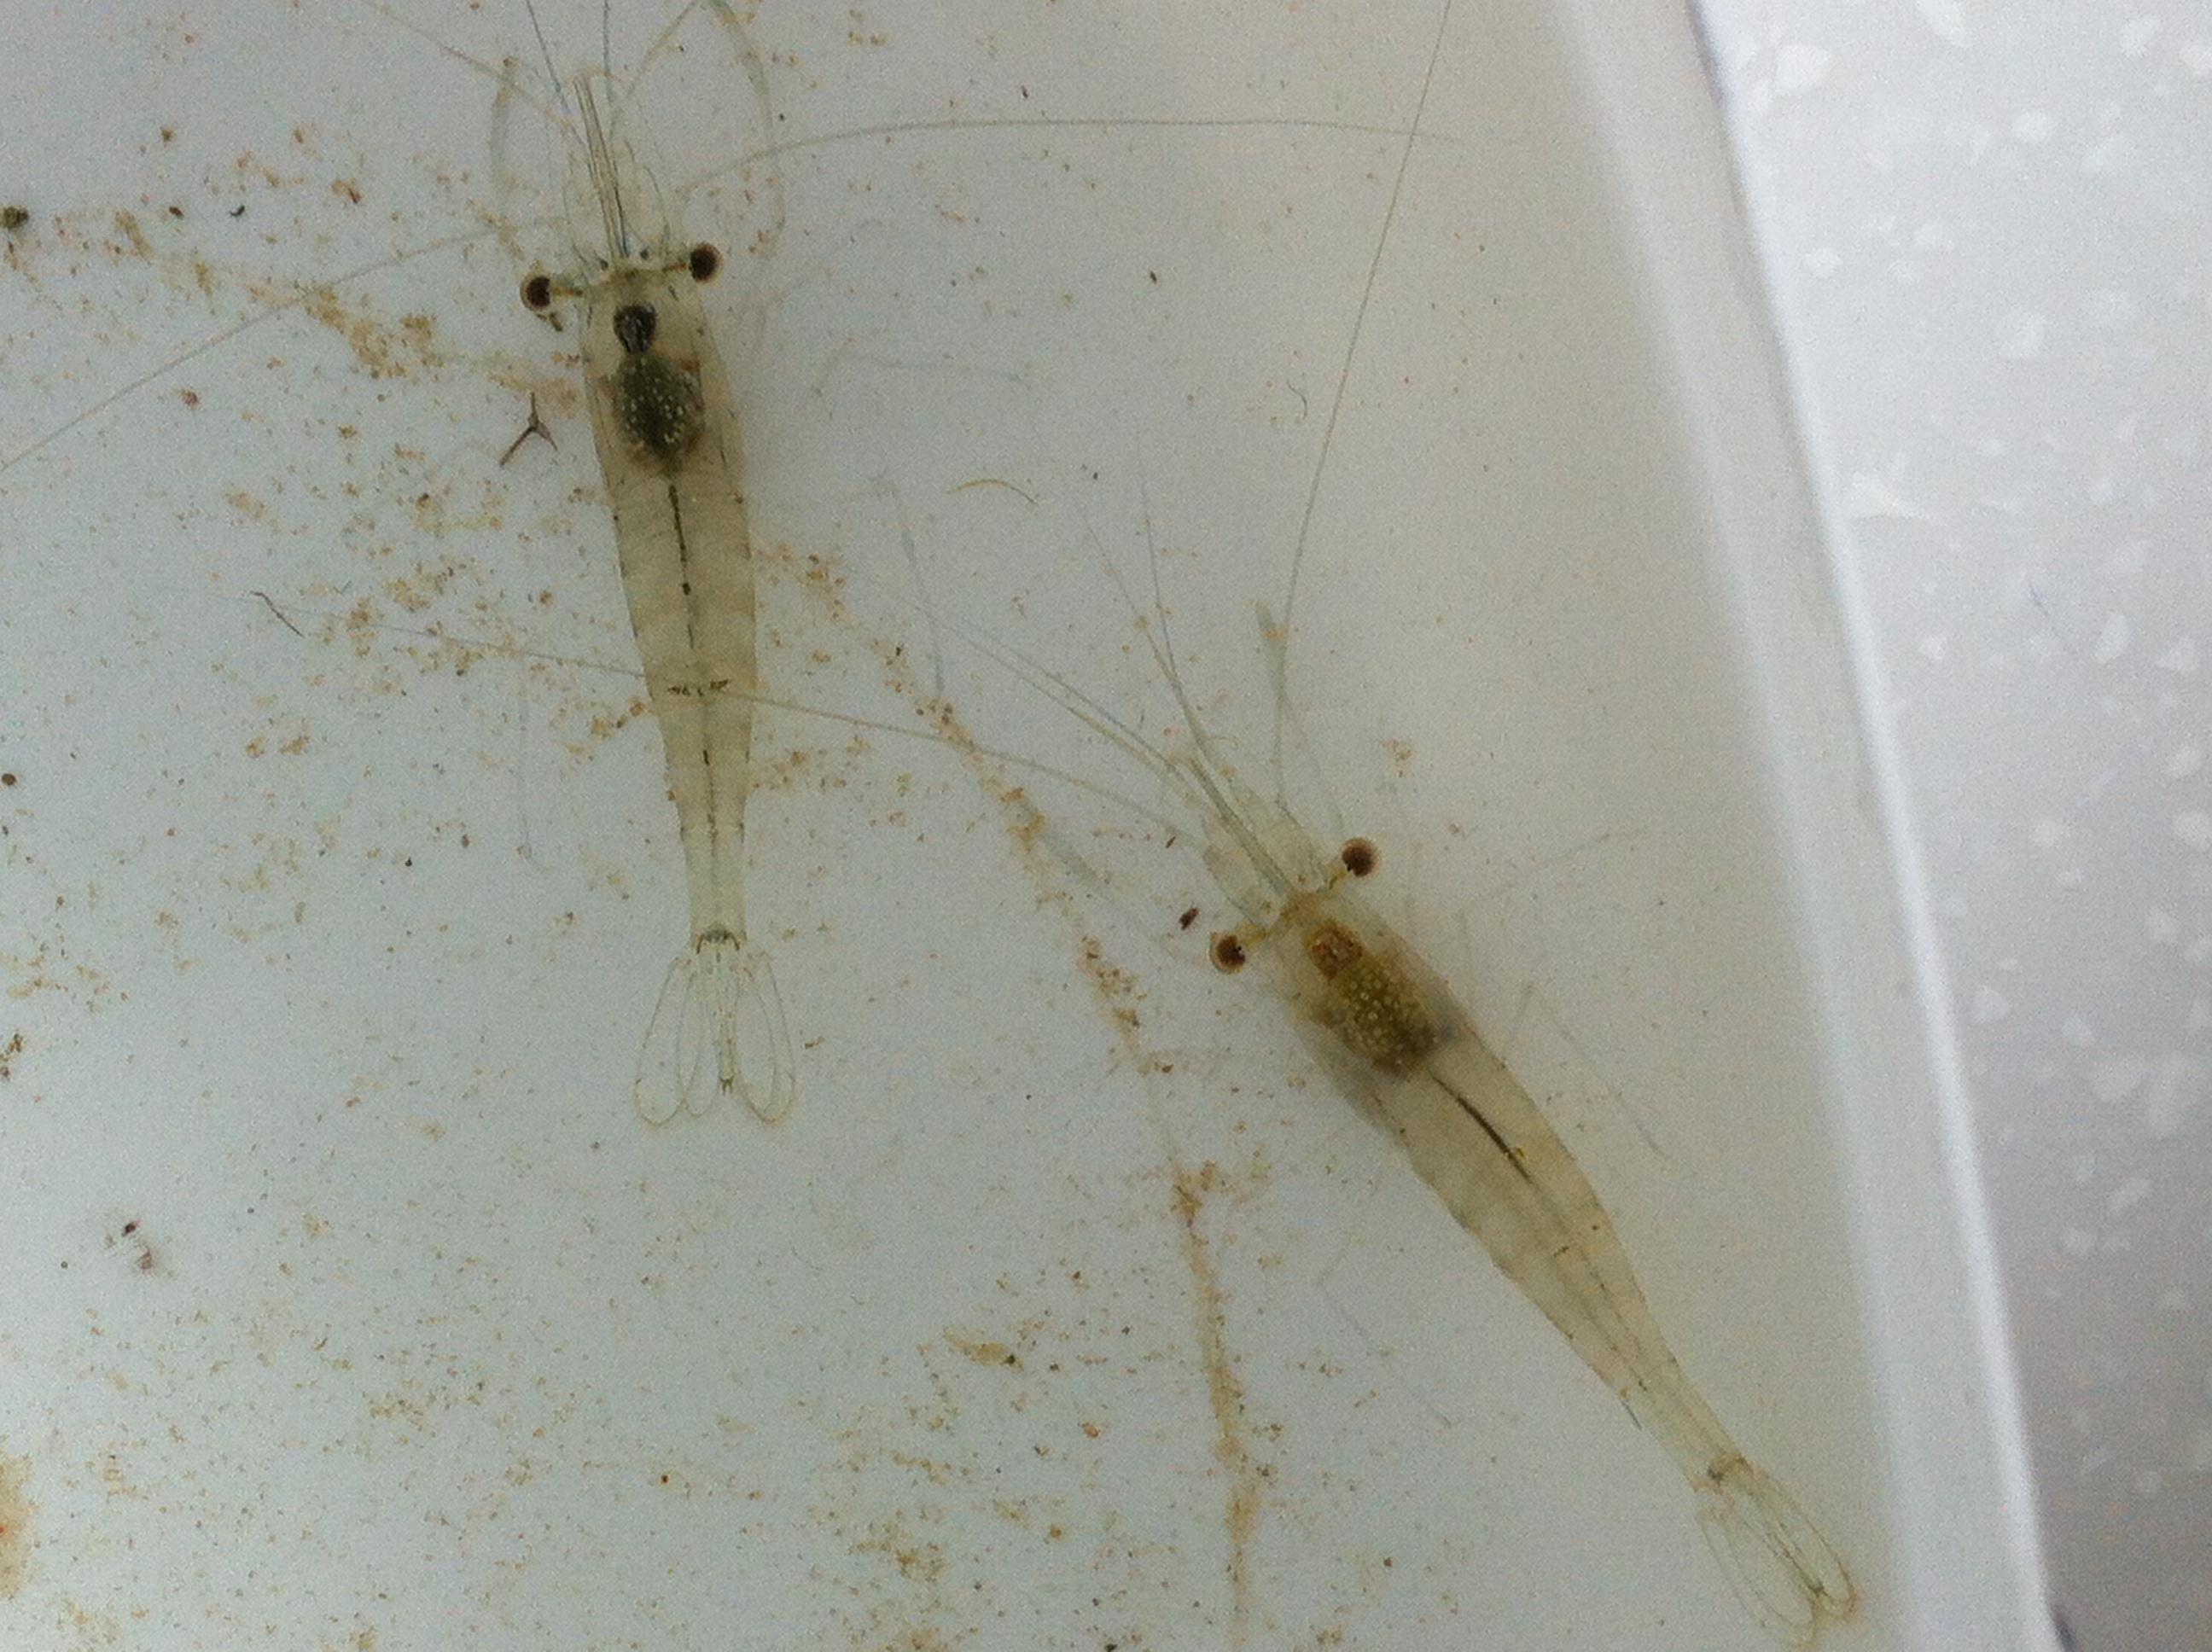 Barred estuarine shrimp